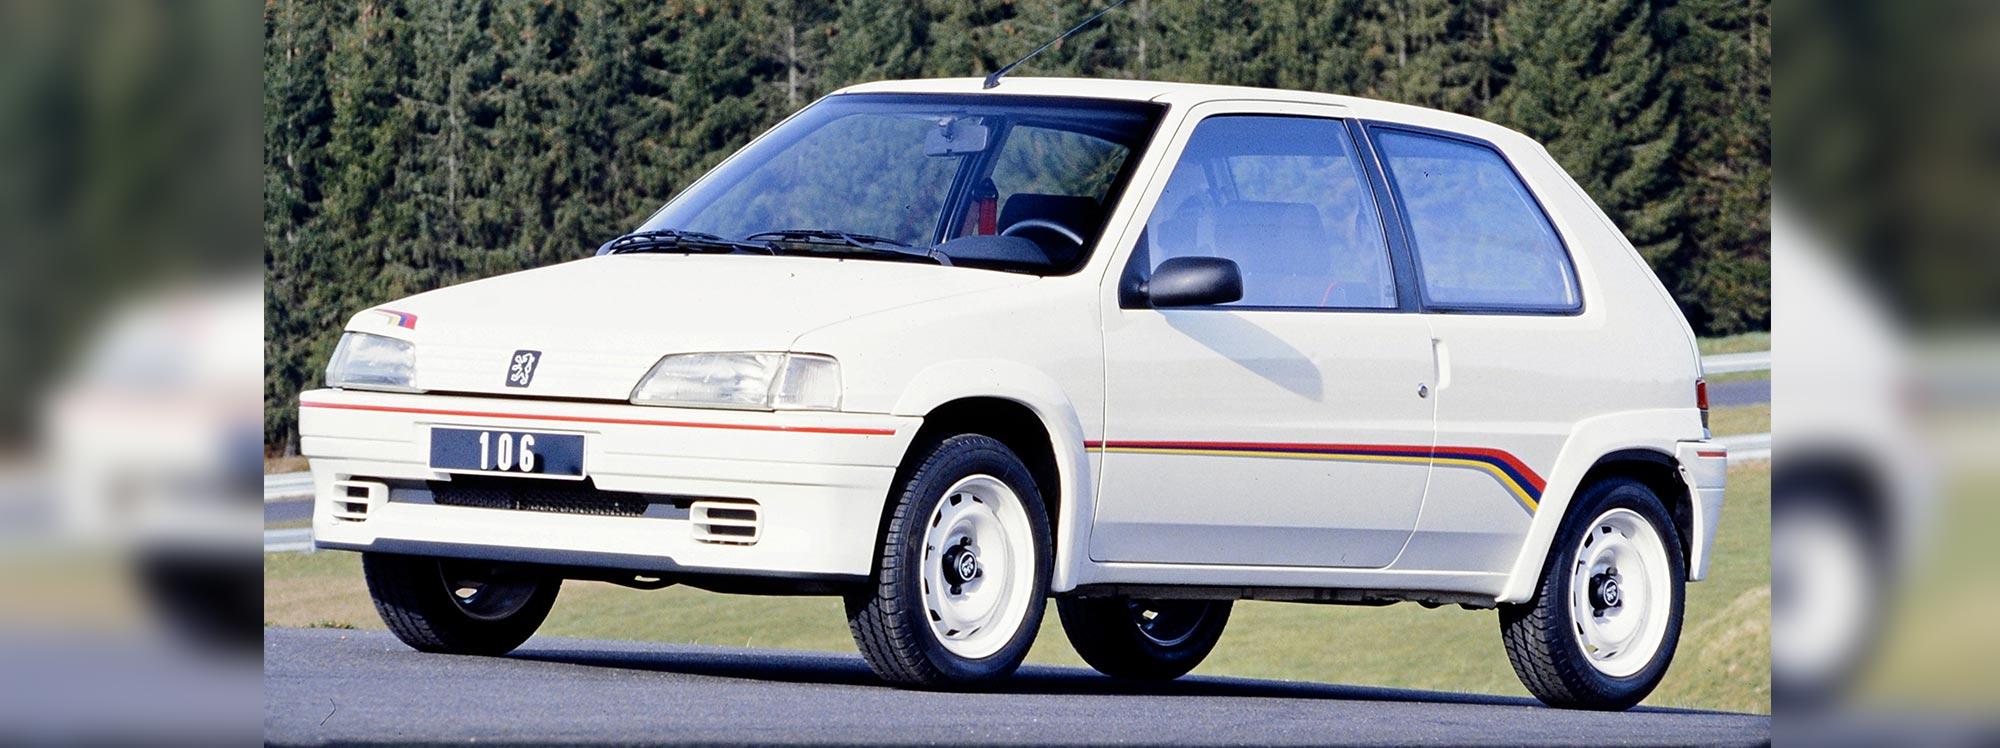 El Peugeot 106 se convertirá en un 'Youngtimer'